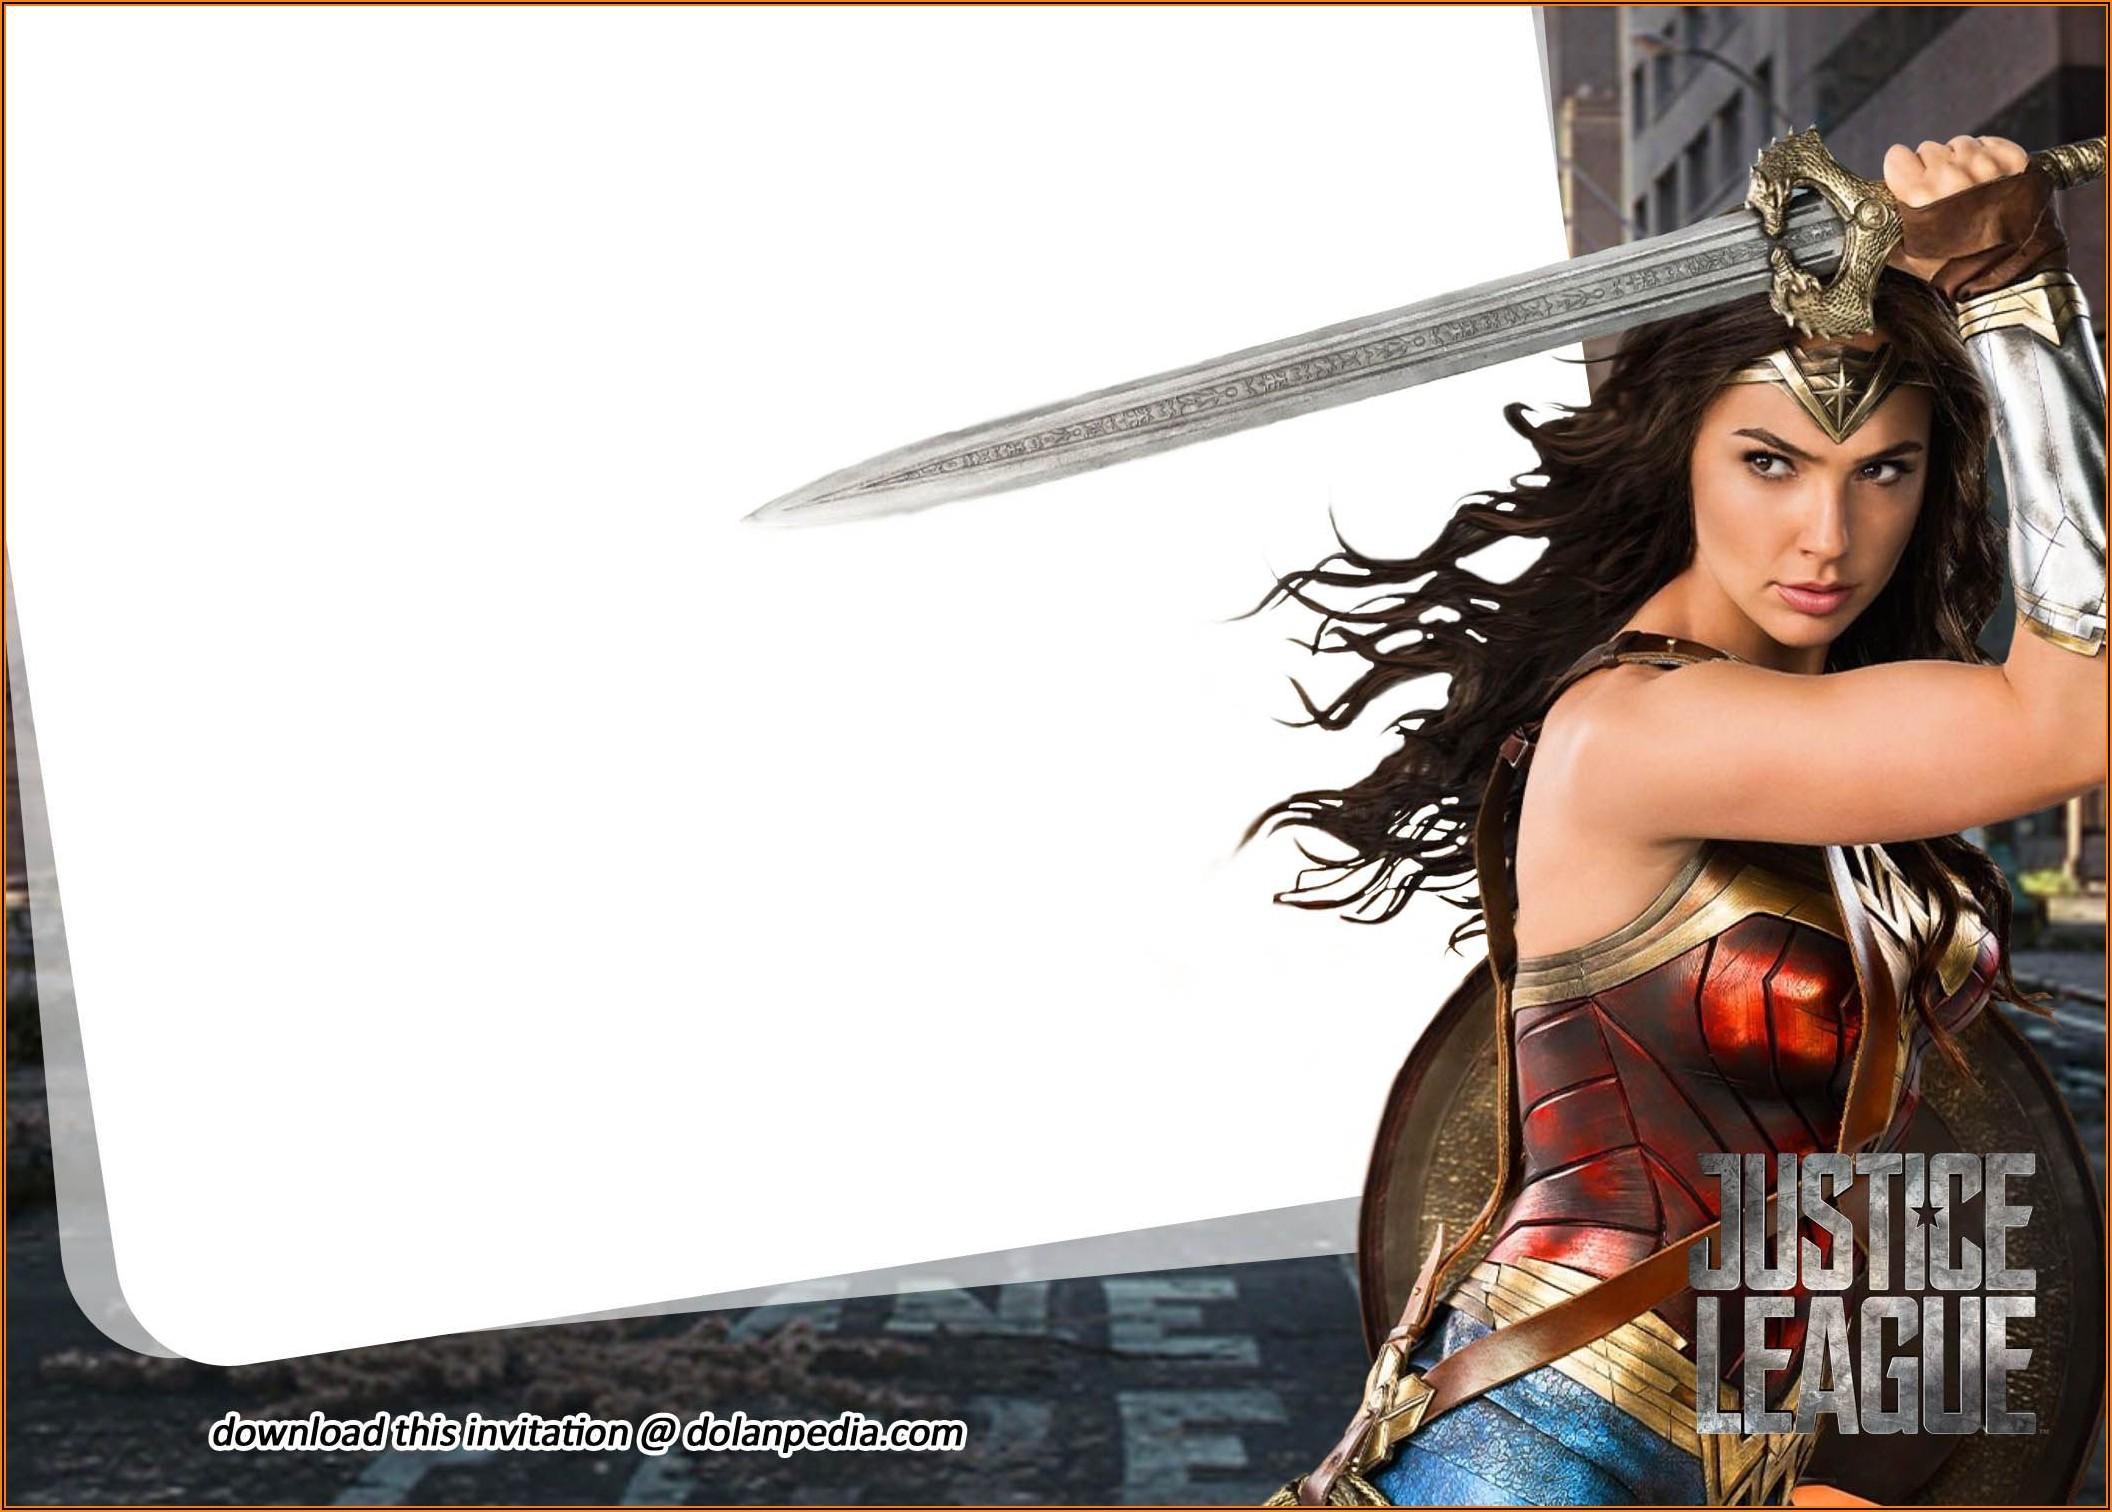 Justice League Birthday Invitations Templates Free